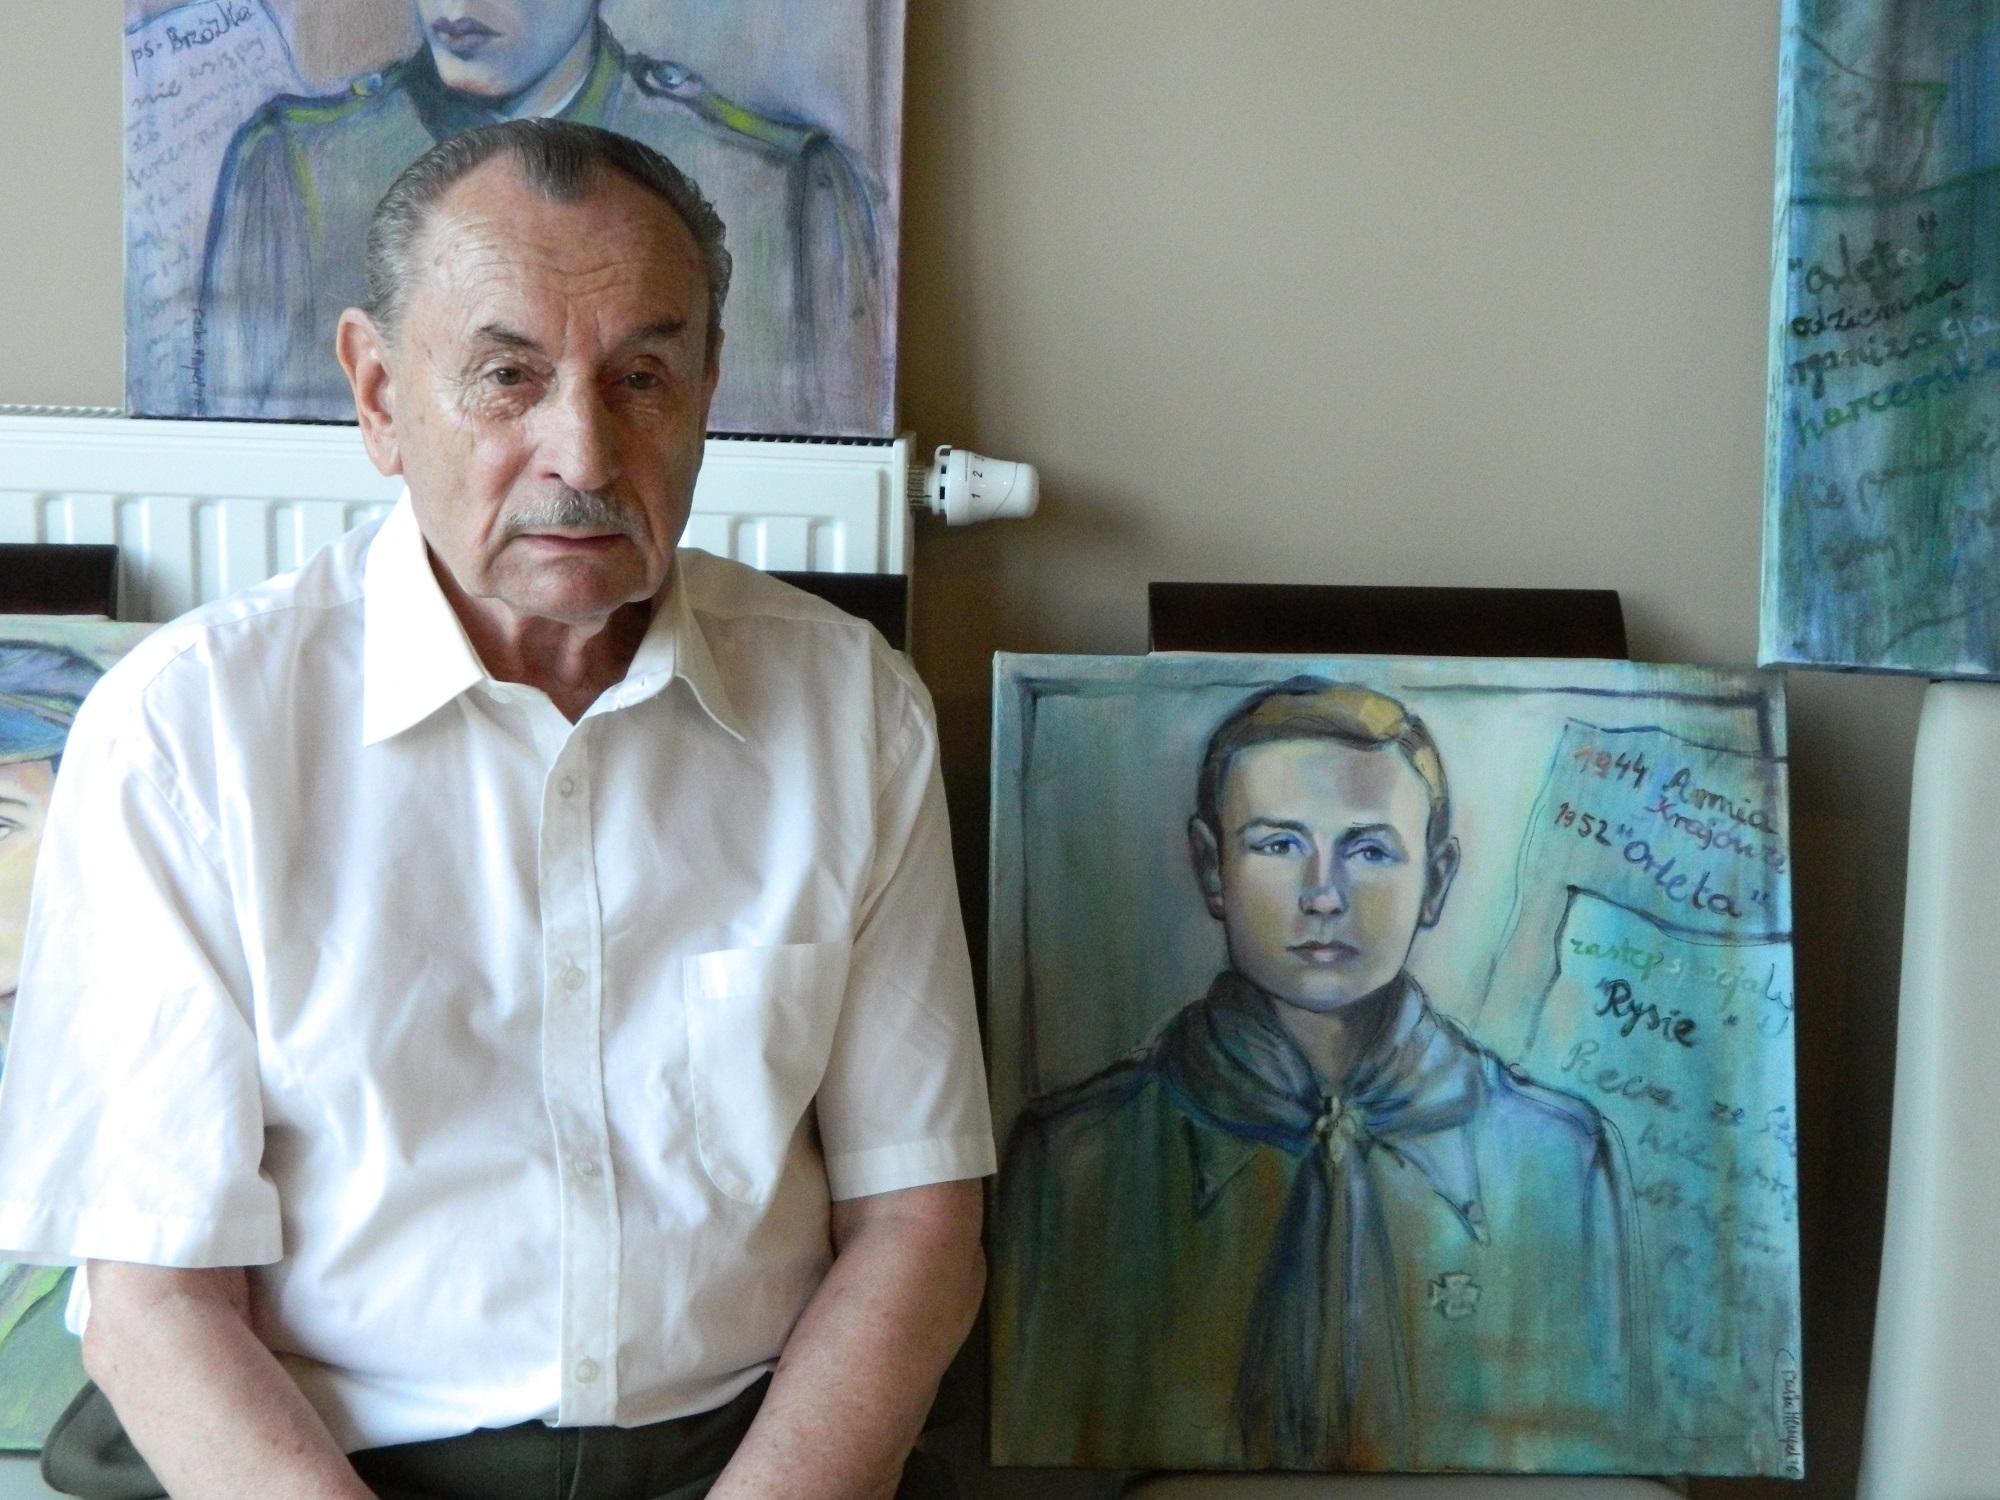 Kol. Ryszard Jakubowski